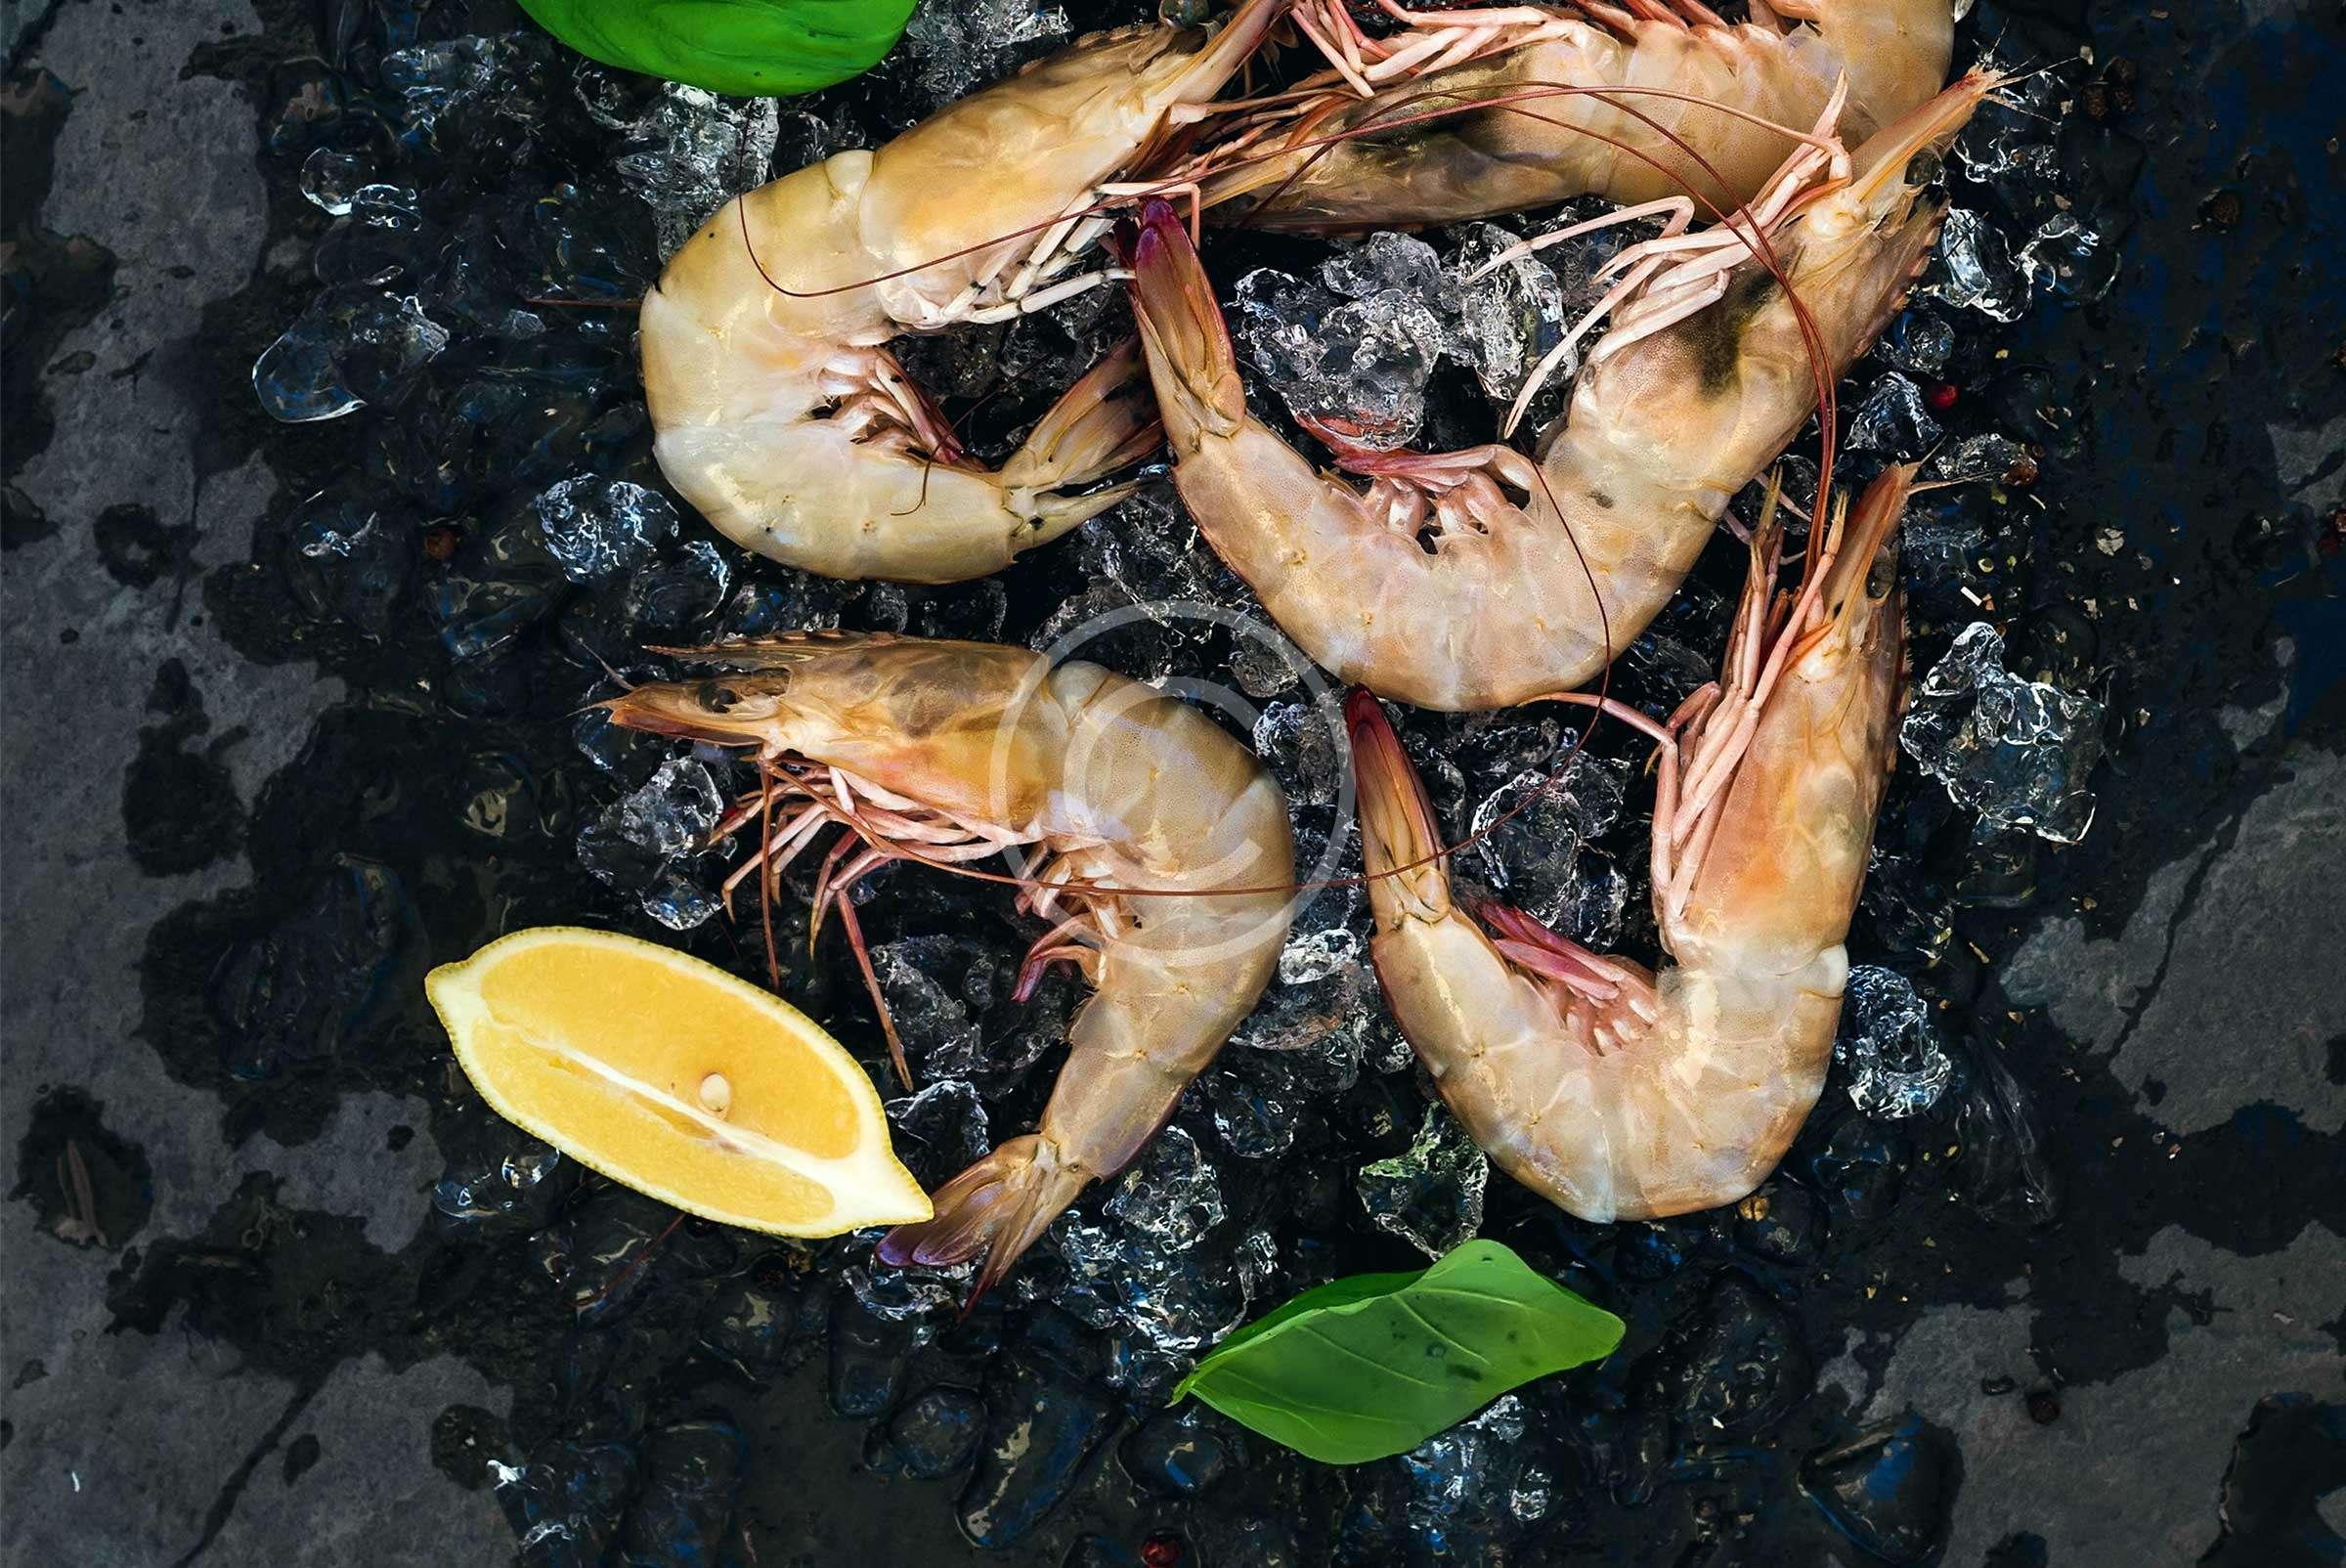 5 Steps to the Best Grilled Shrimp